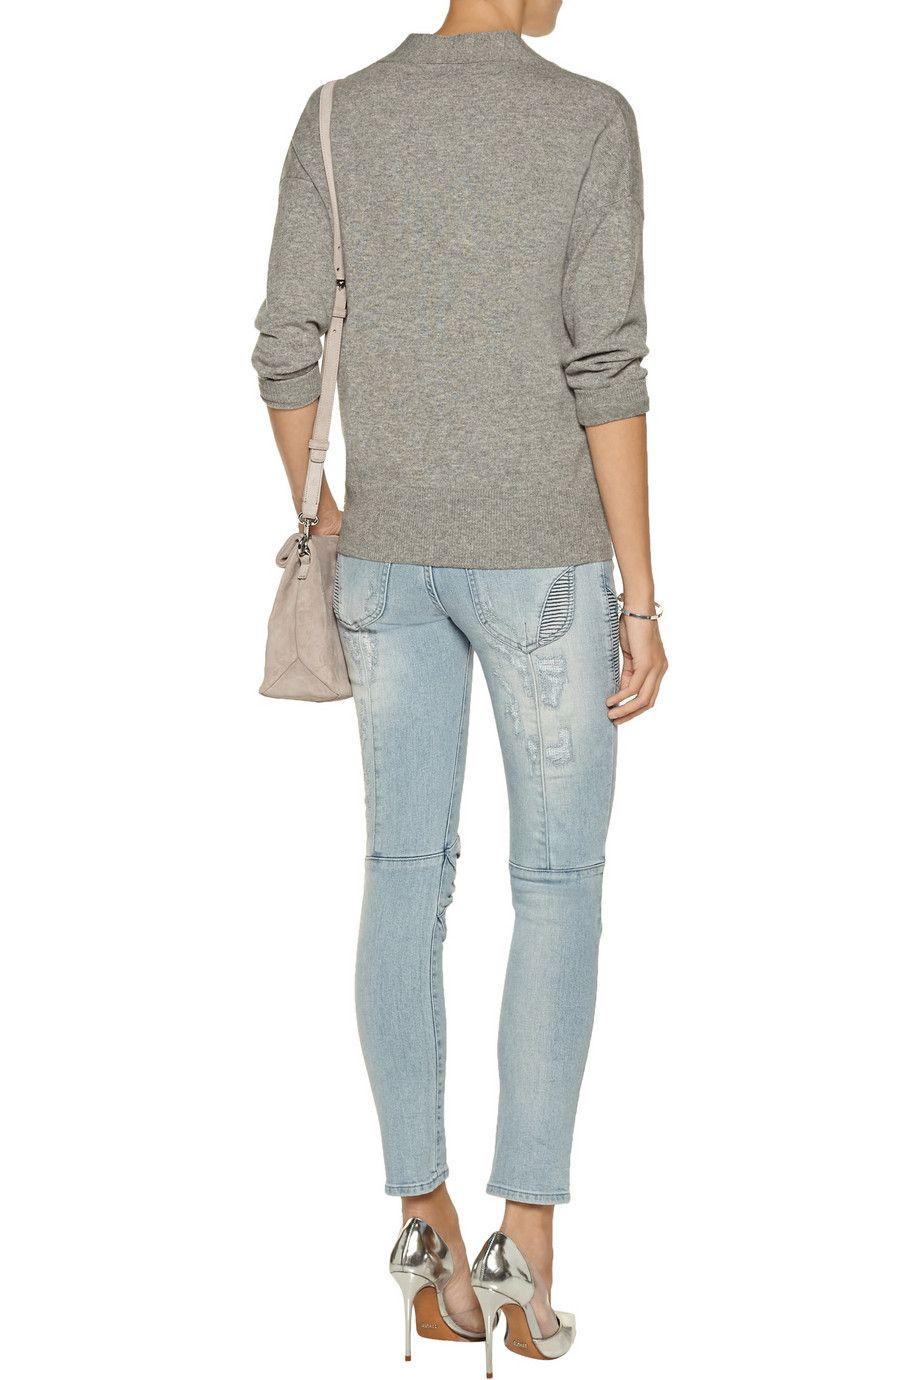 Pierre BalmainLow-rise skinny jeansclose up